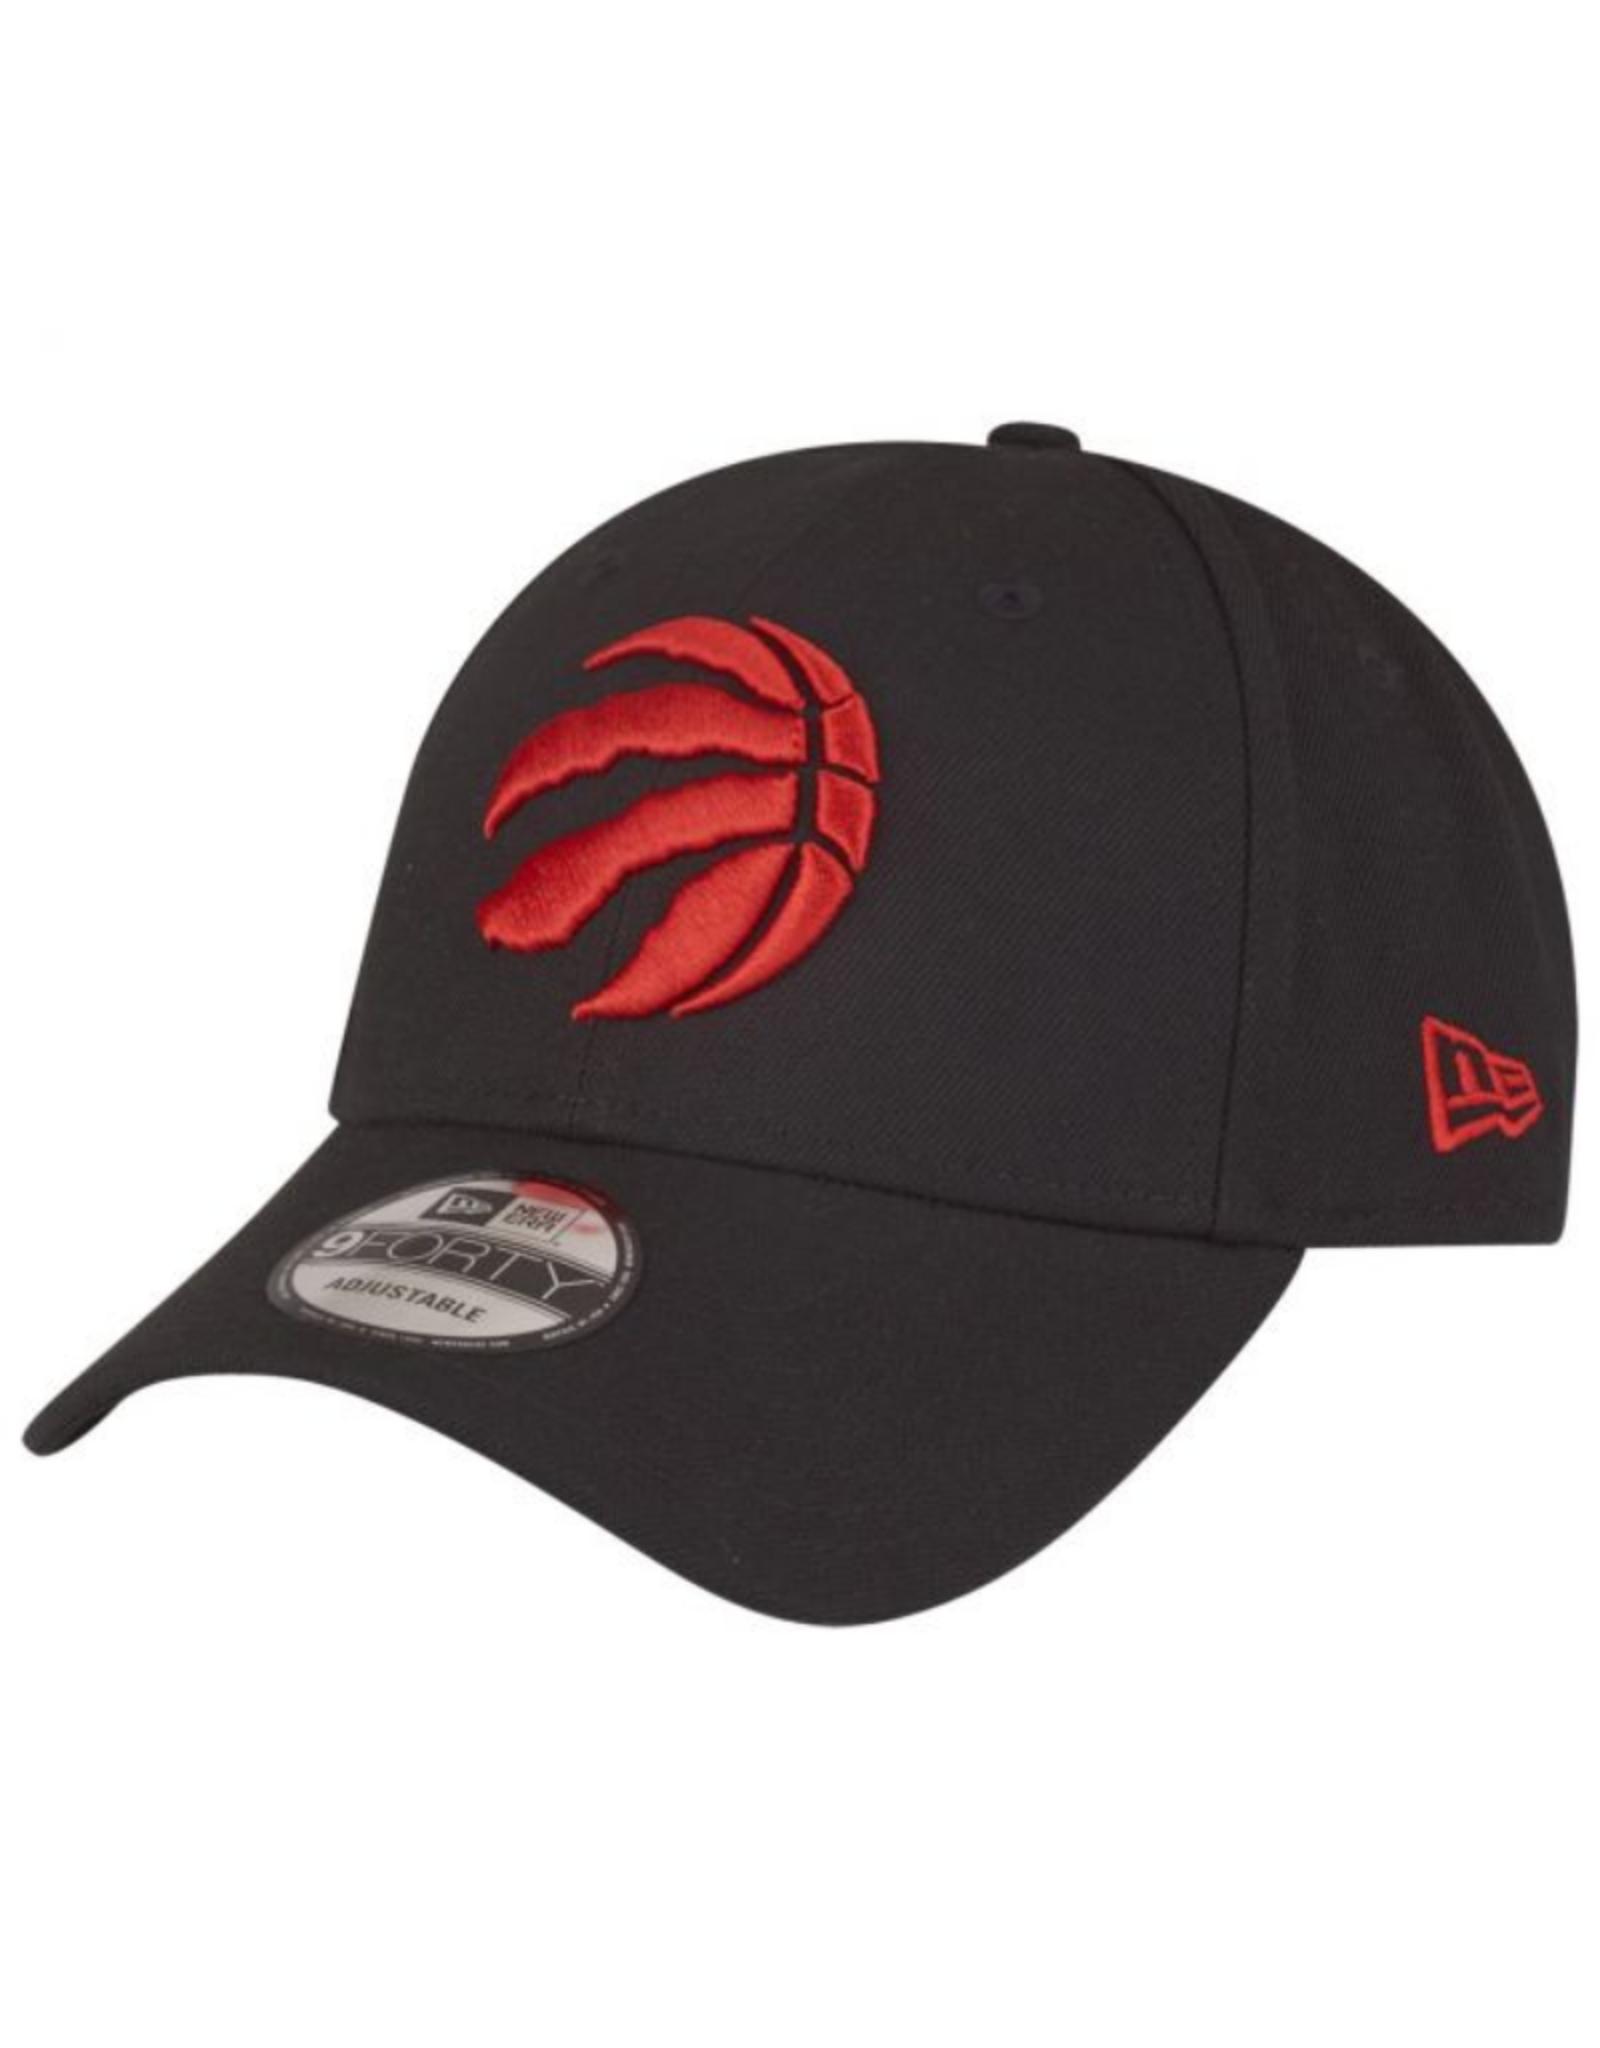 New Era Youth The League Adjustable Hat Toronto Raptors Black